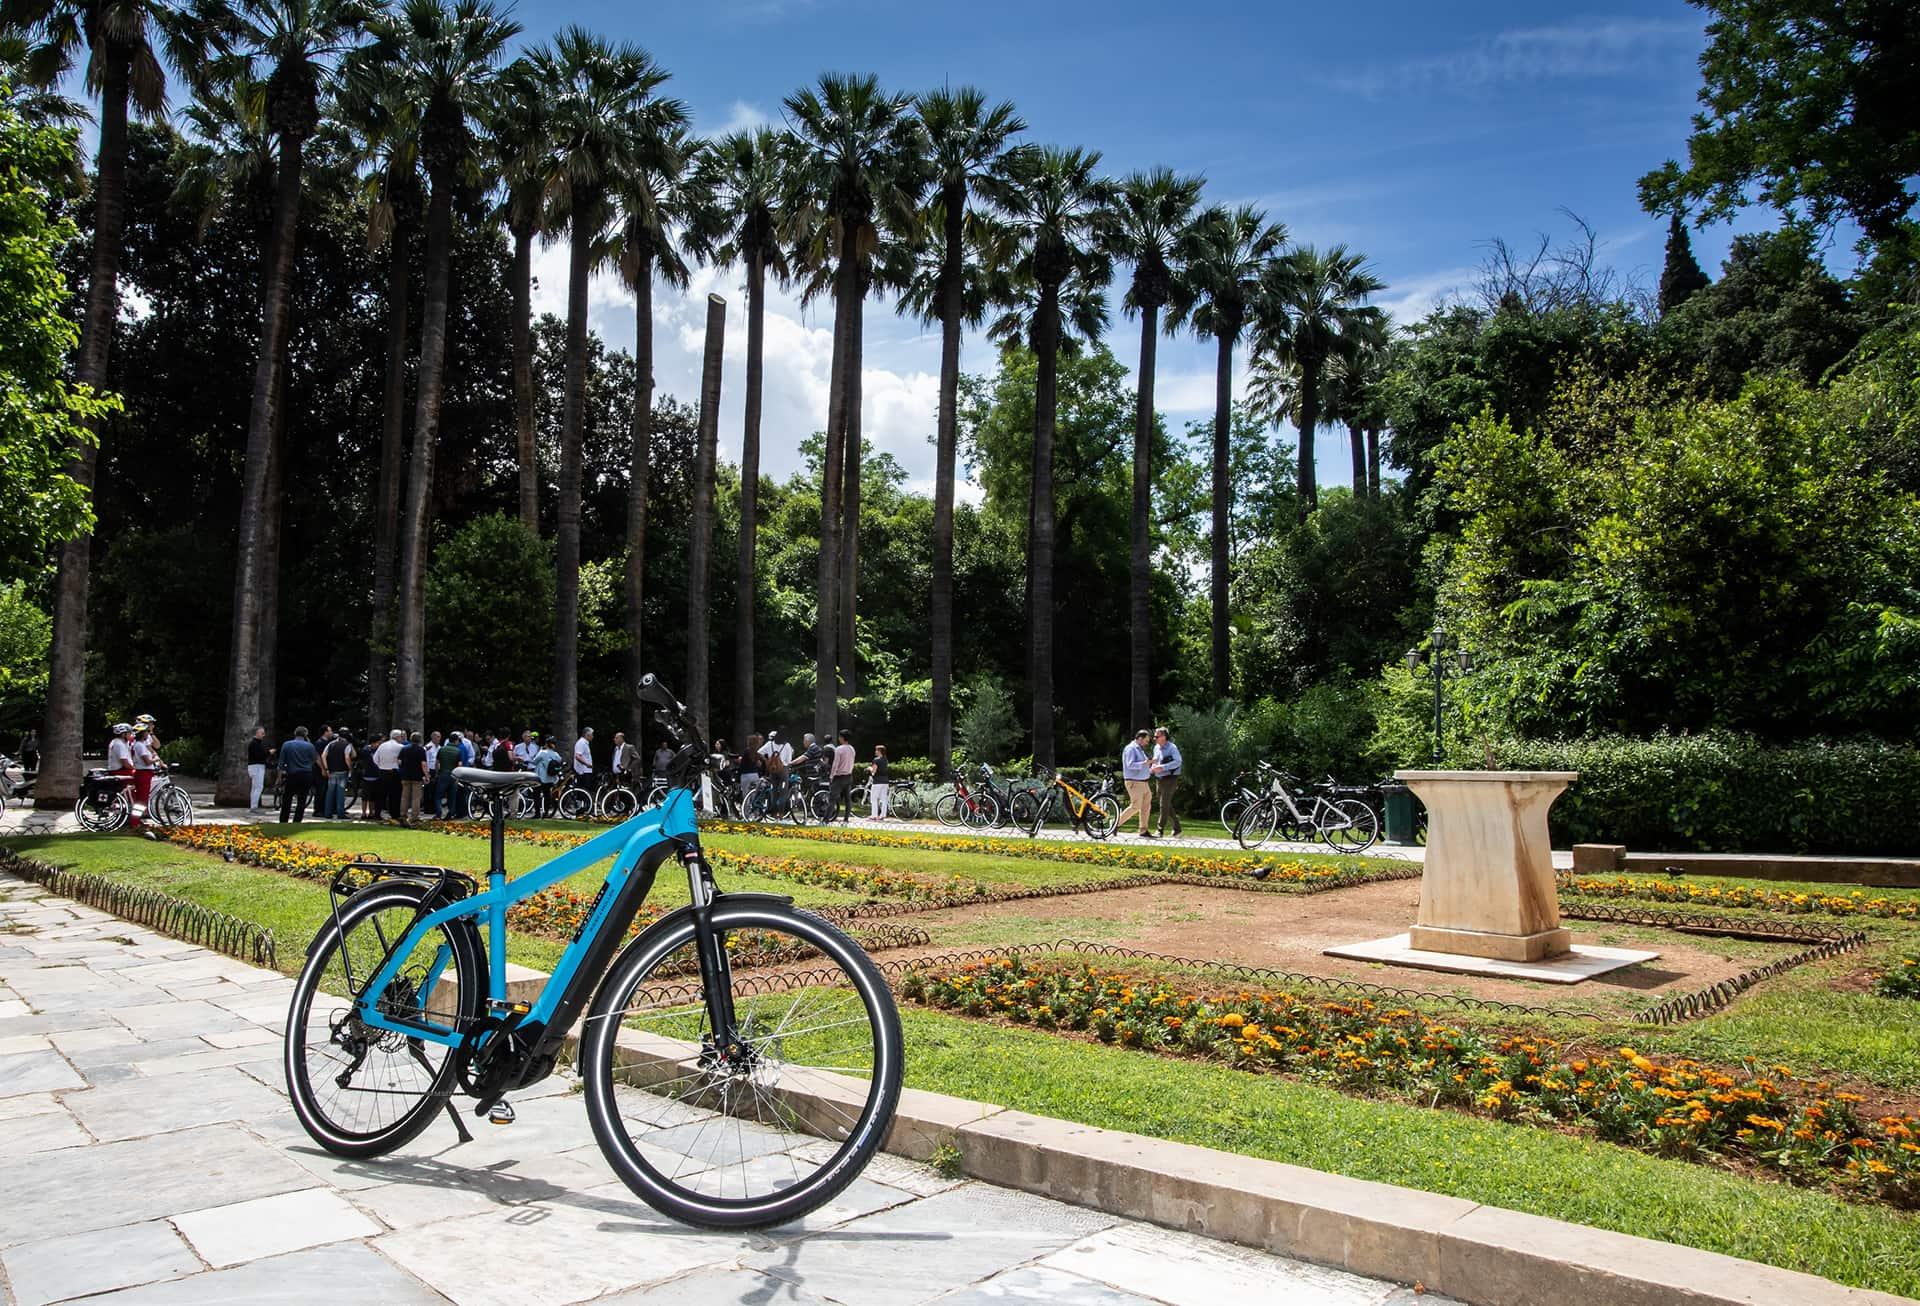 KOSMORIDE - Παγκόσμια ημέρα ποδηλάτου